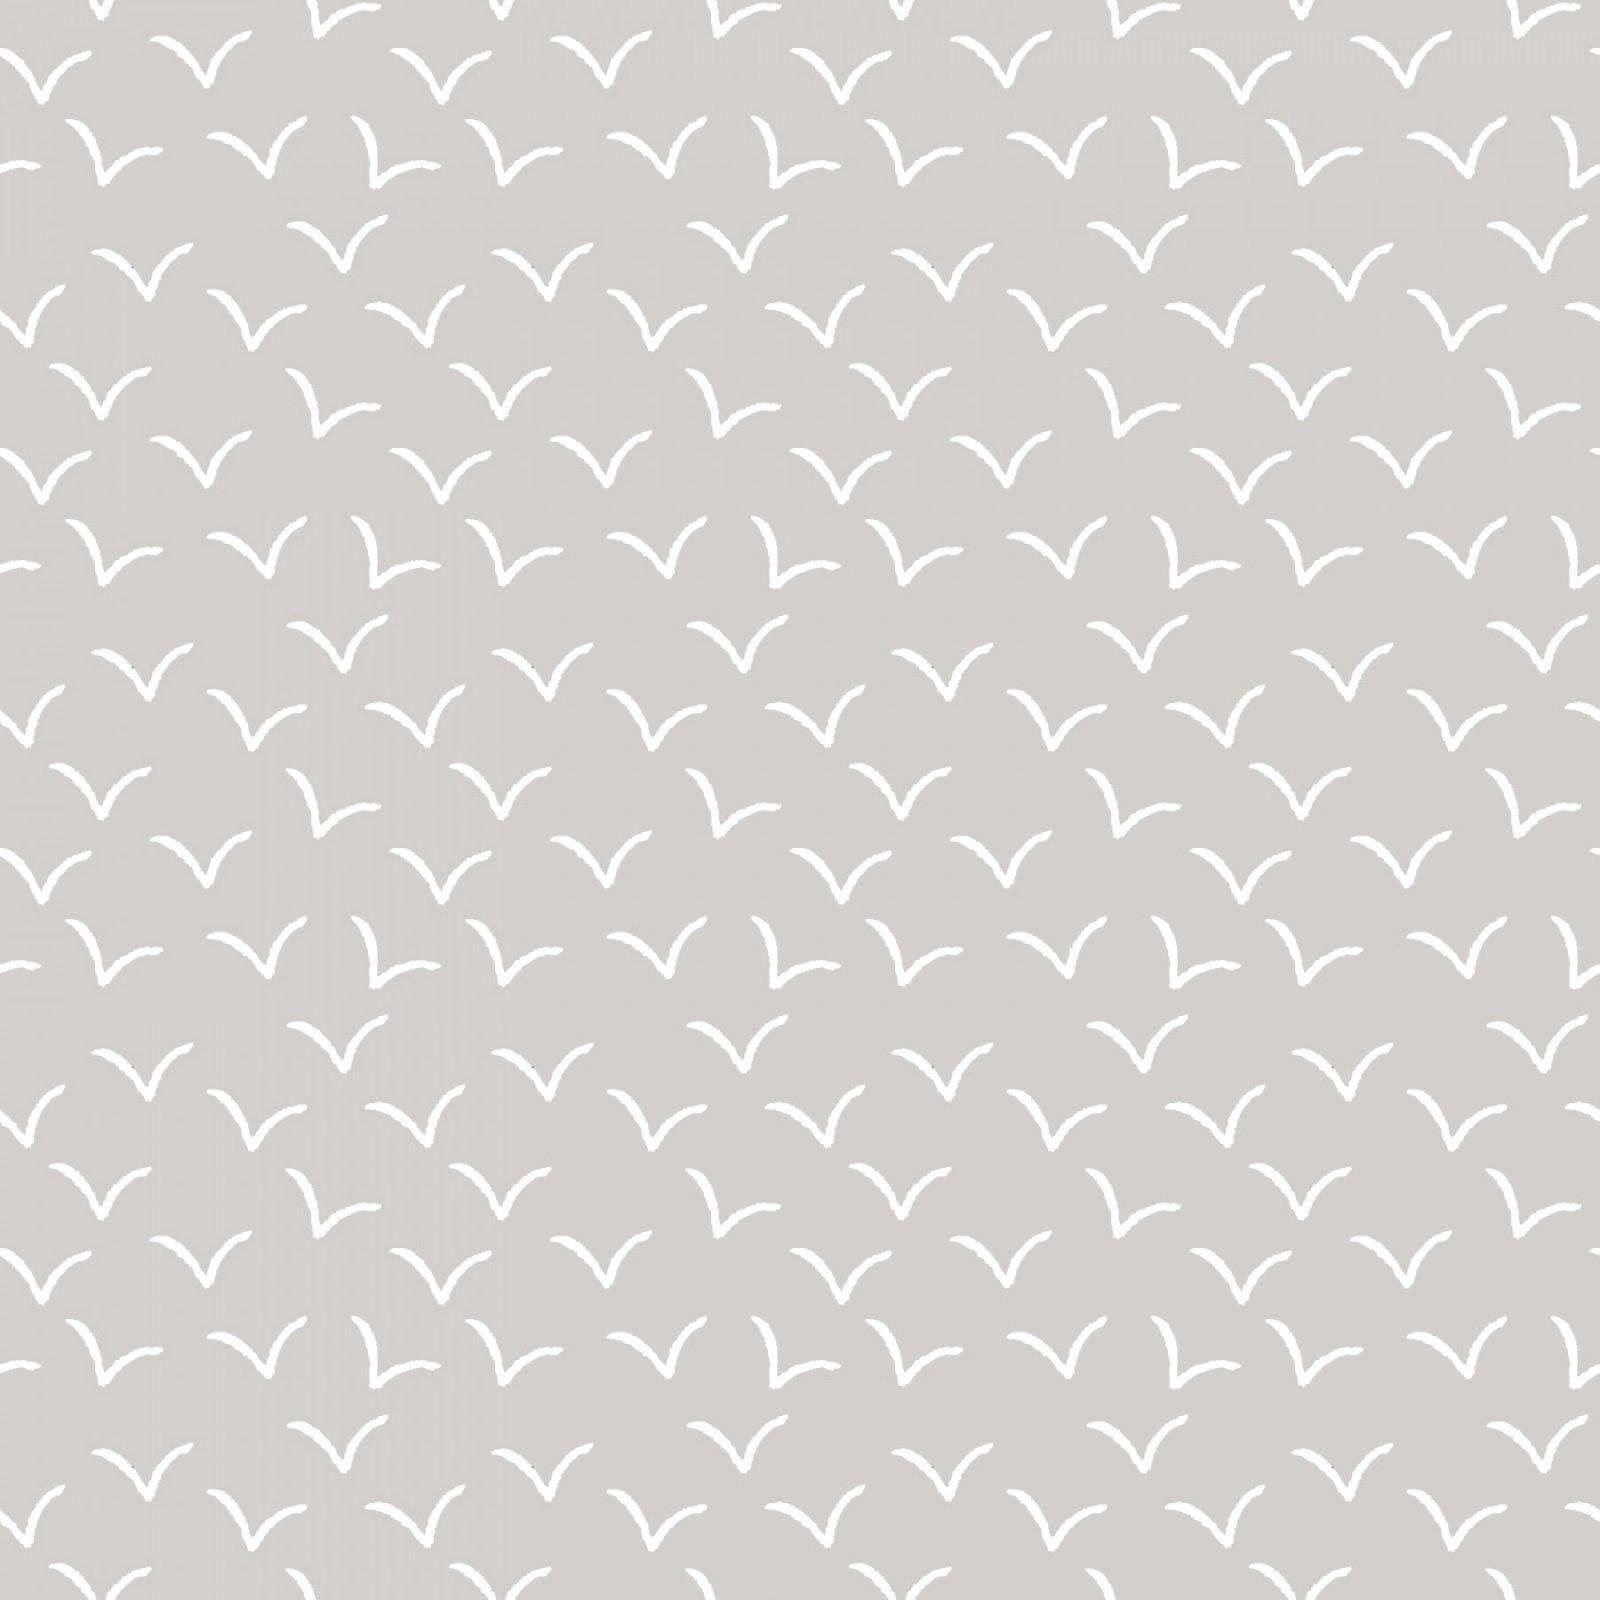 3W BASICS BIRDS-GRAY